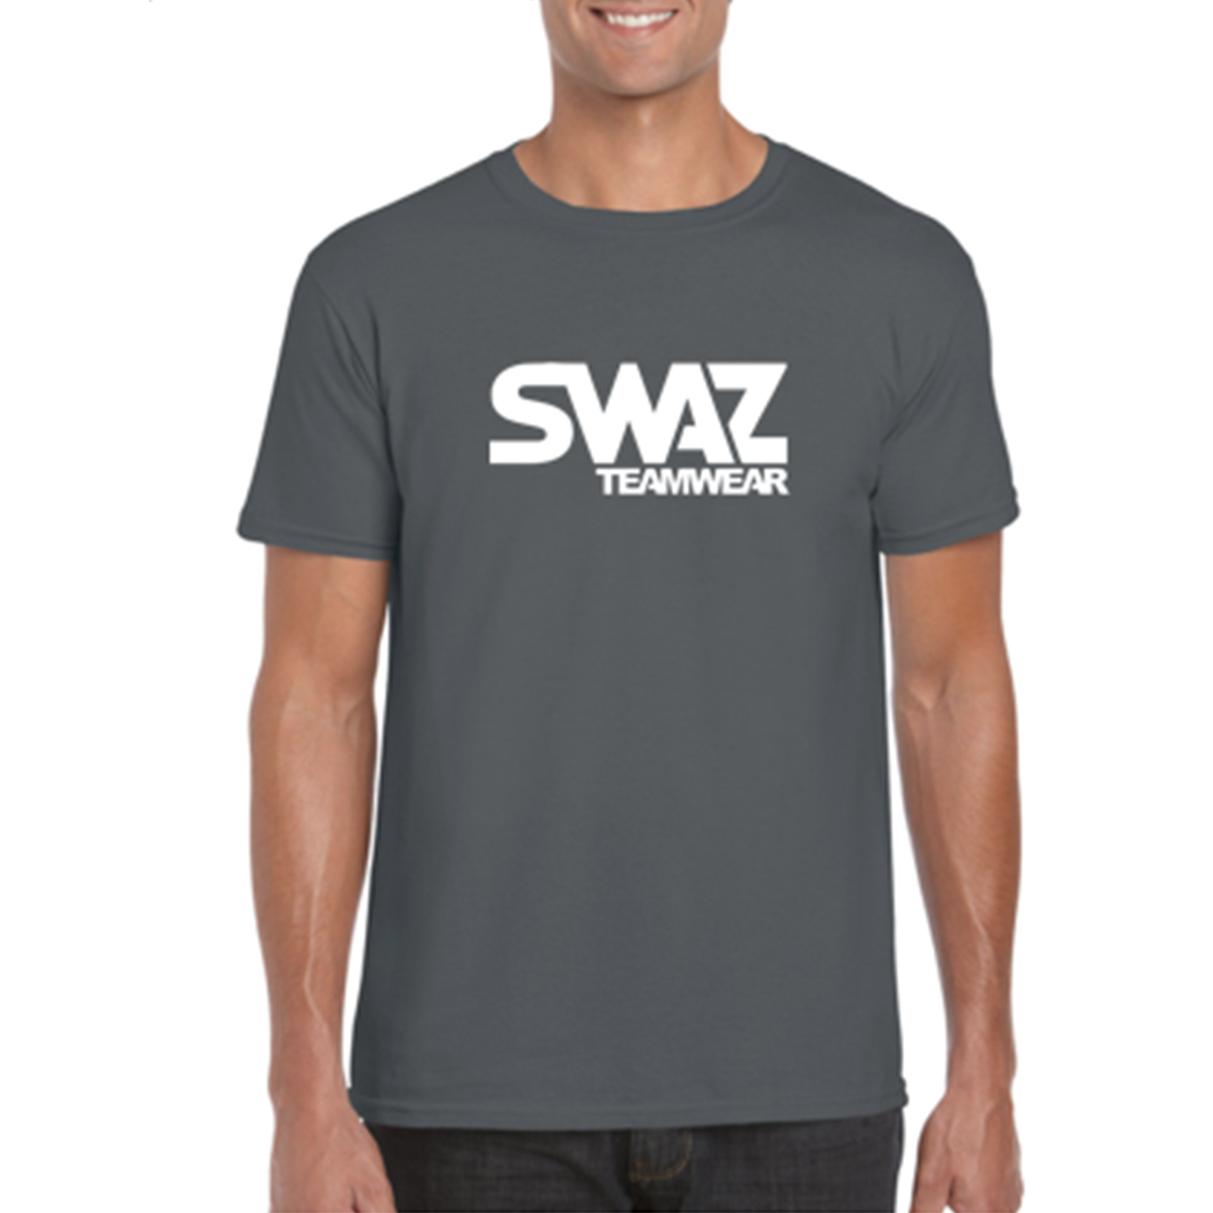 SWAZ Teamwear Charcoal Classic T-Shirt